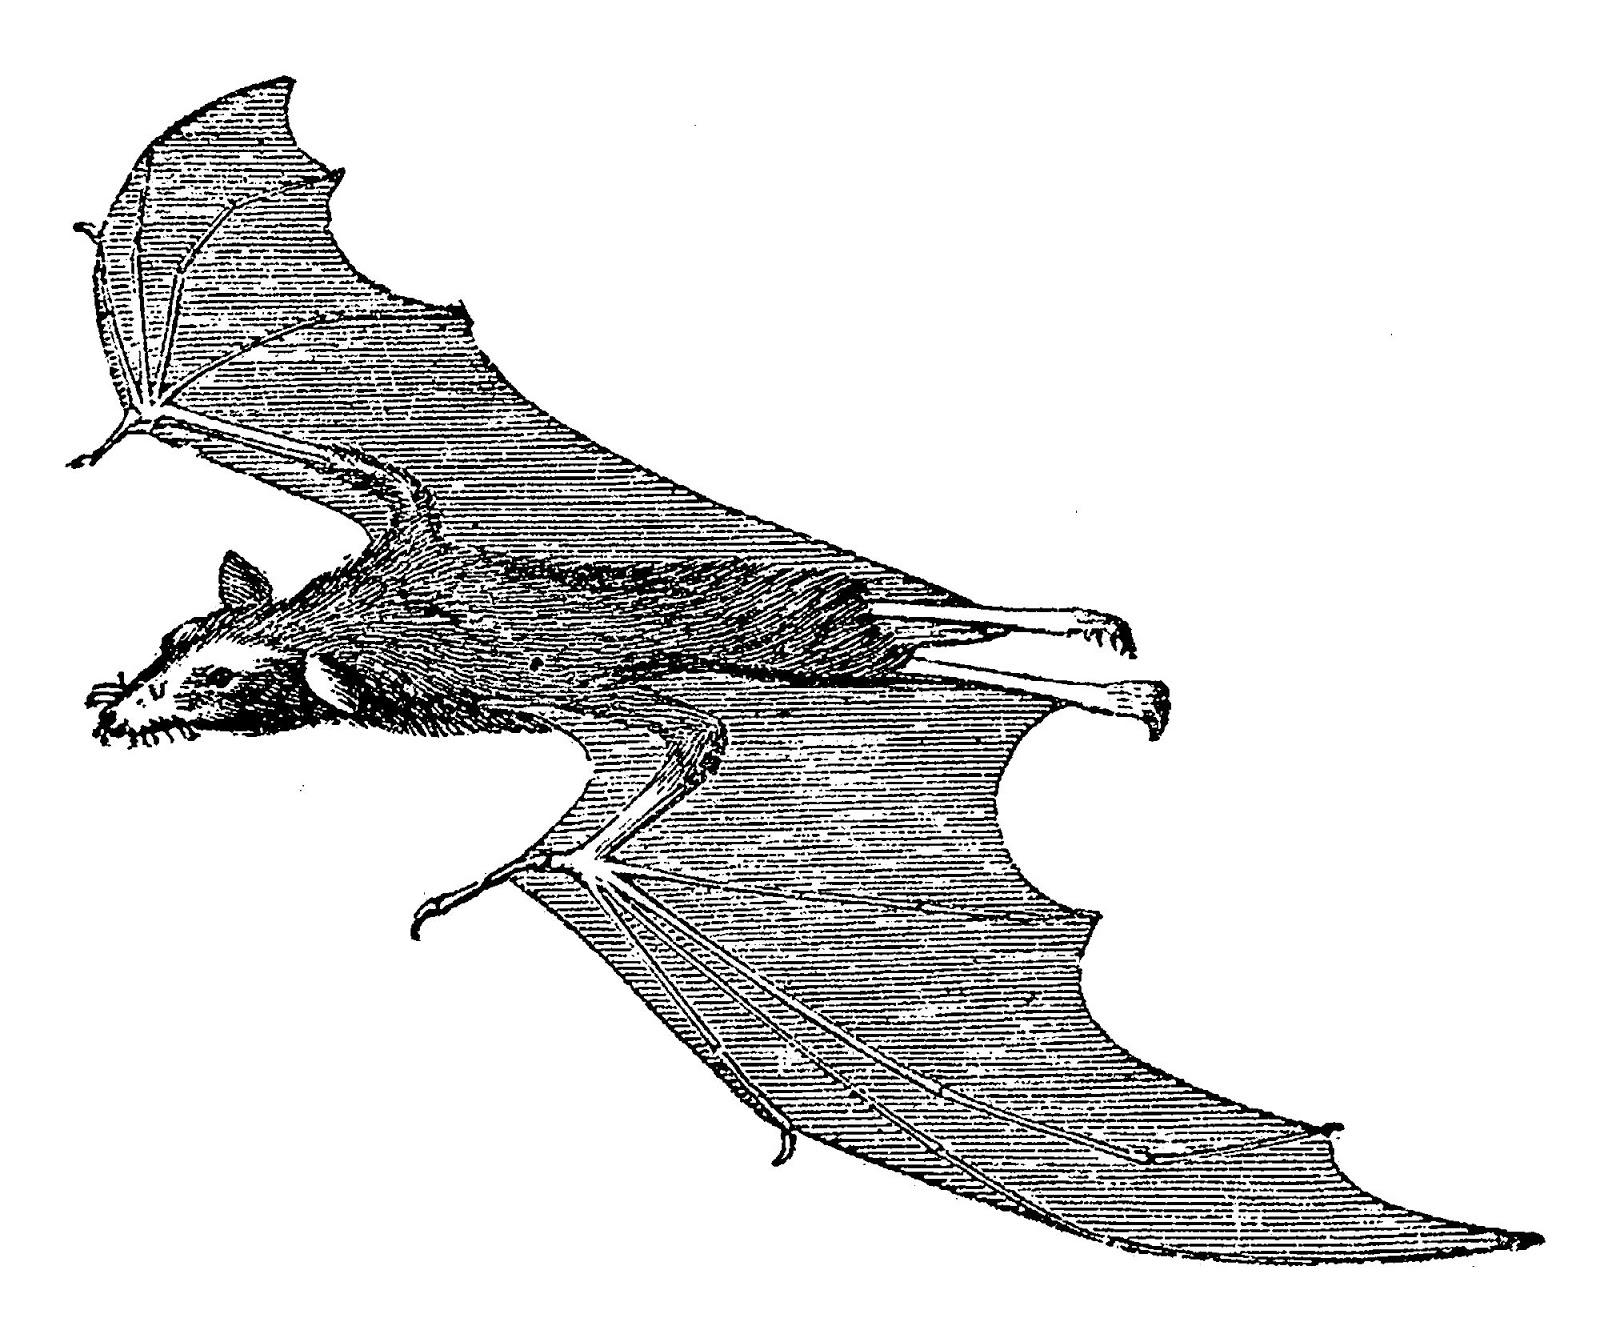 Digital Stamp Design: Halloweeen Scary Flying Vampire Bat ...